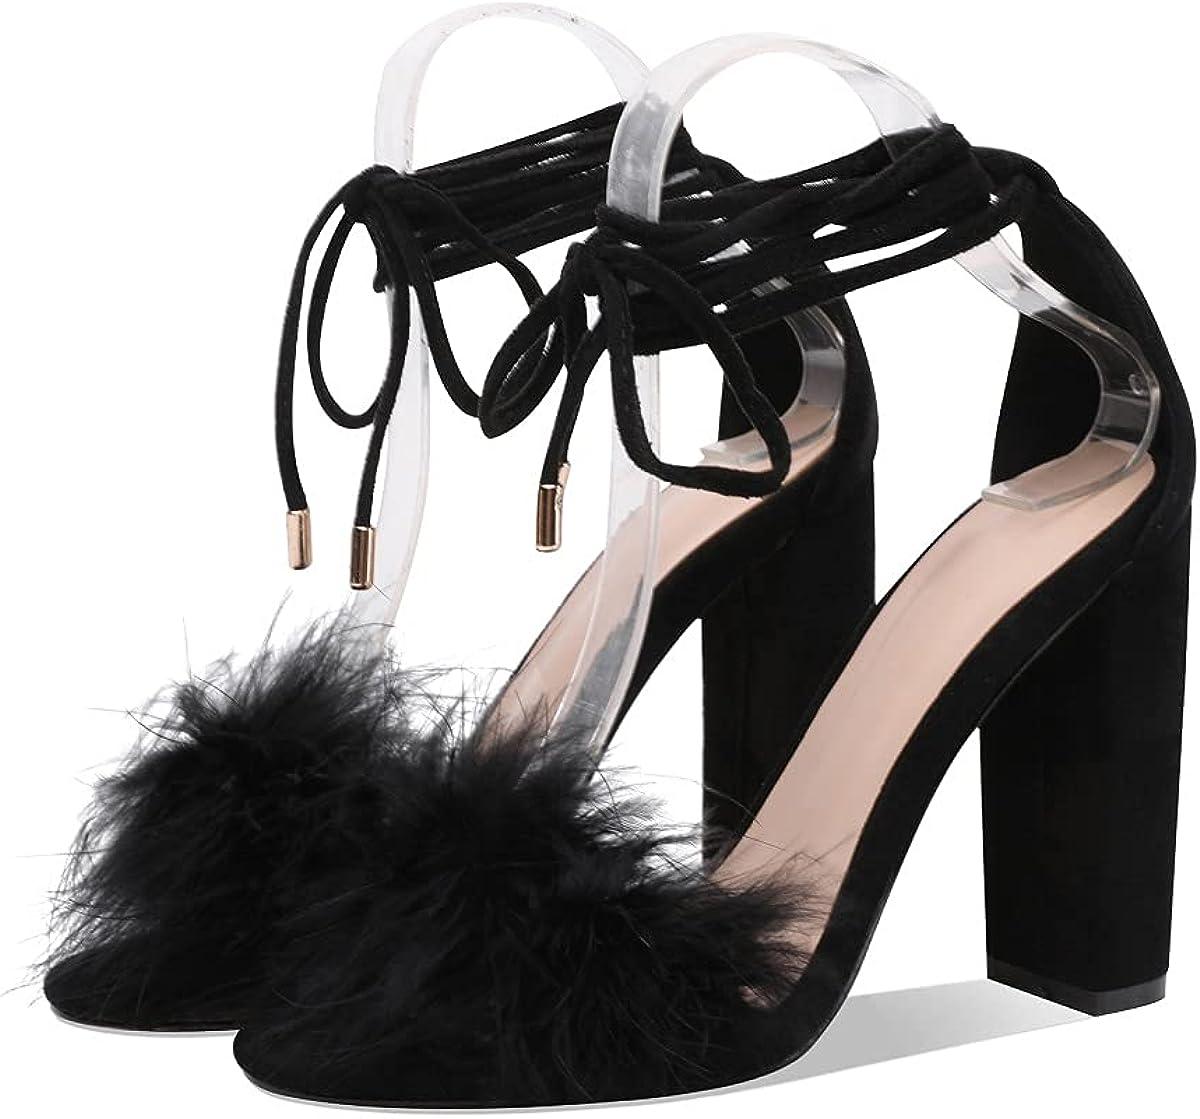 Women's 店内限界値引き中 セルフラッピング無料 Block Heels Fluffy Sandals Fur 初回限定